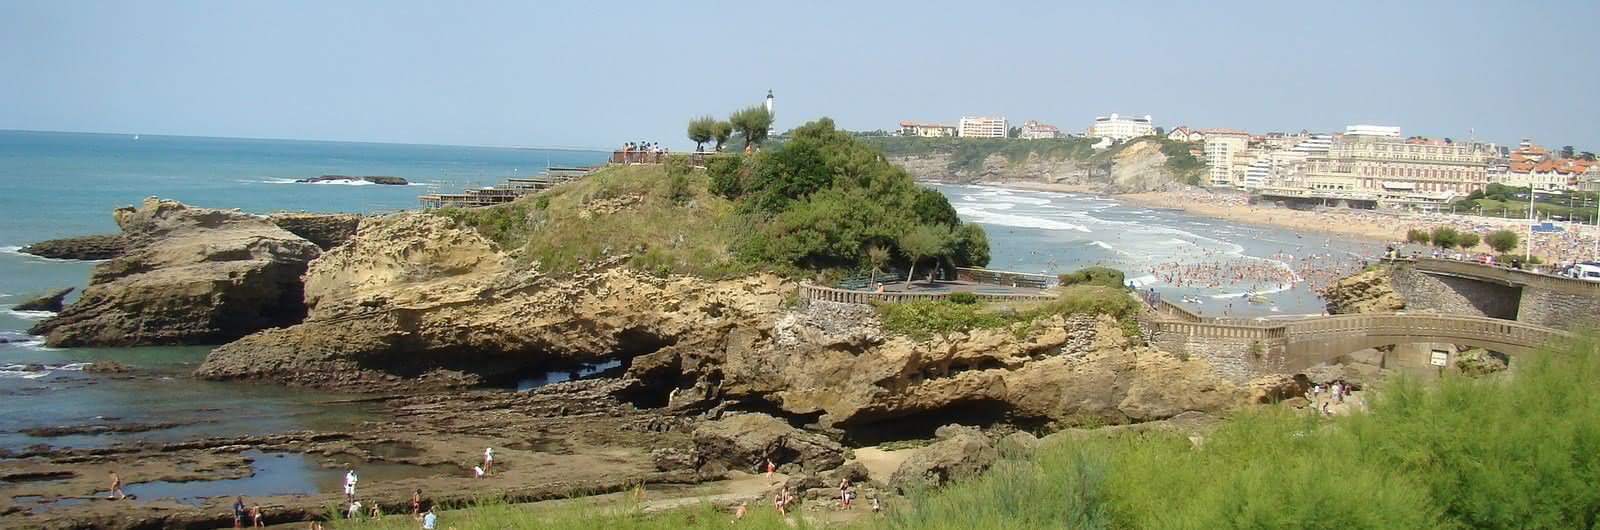 biarritz city header